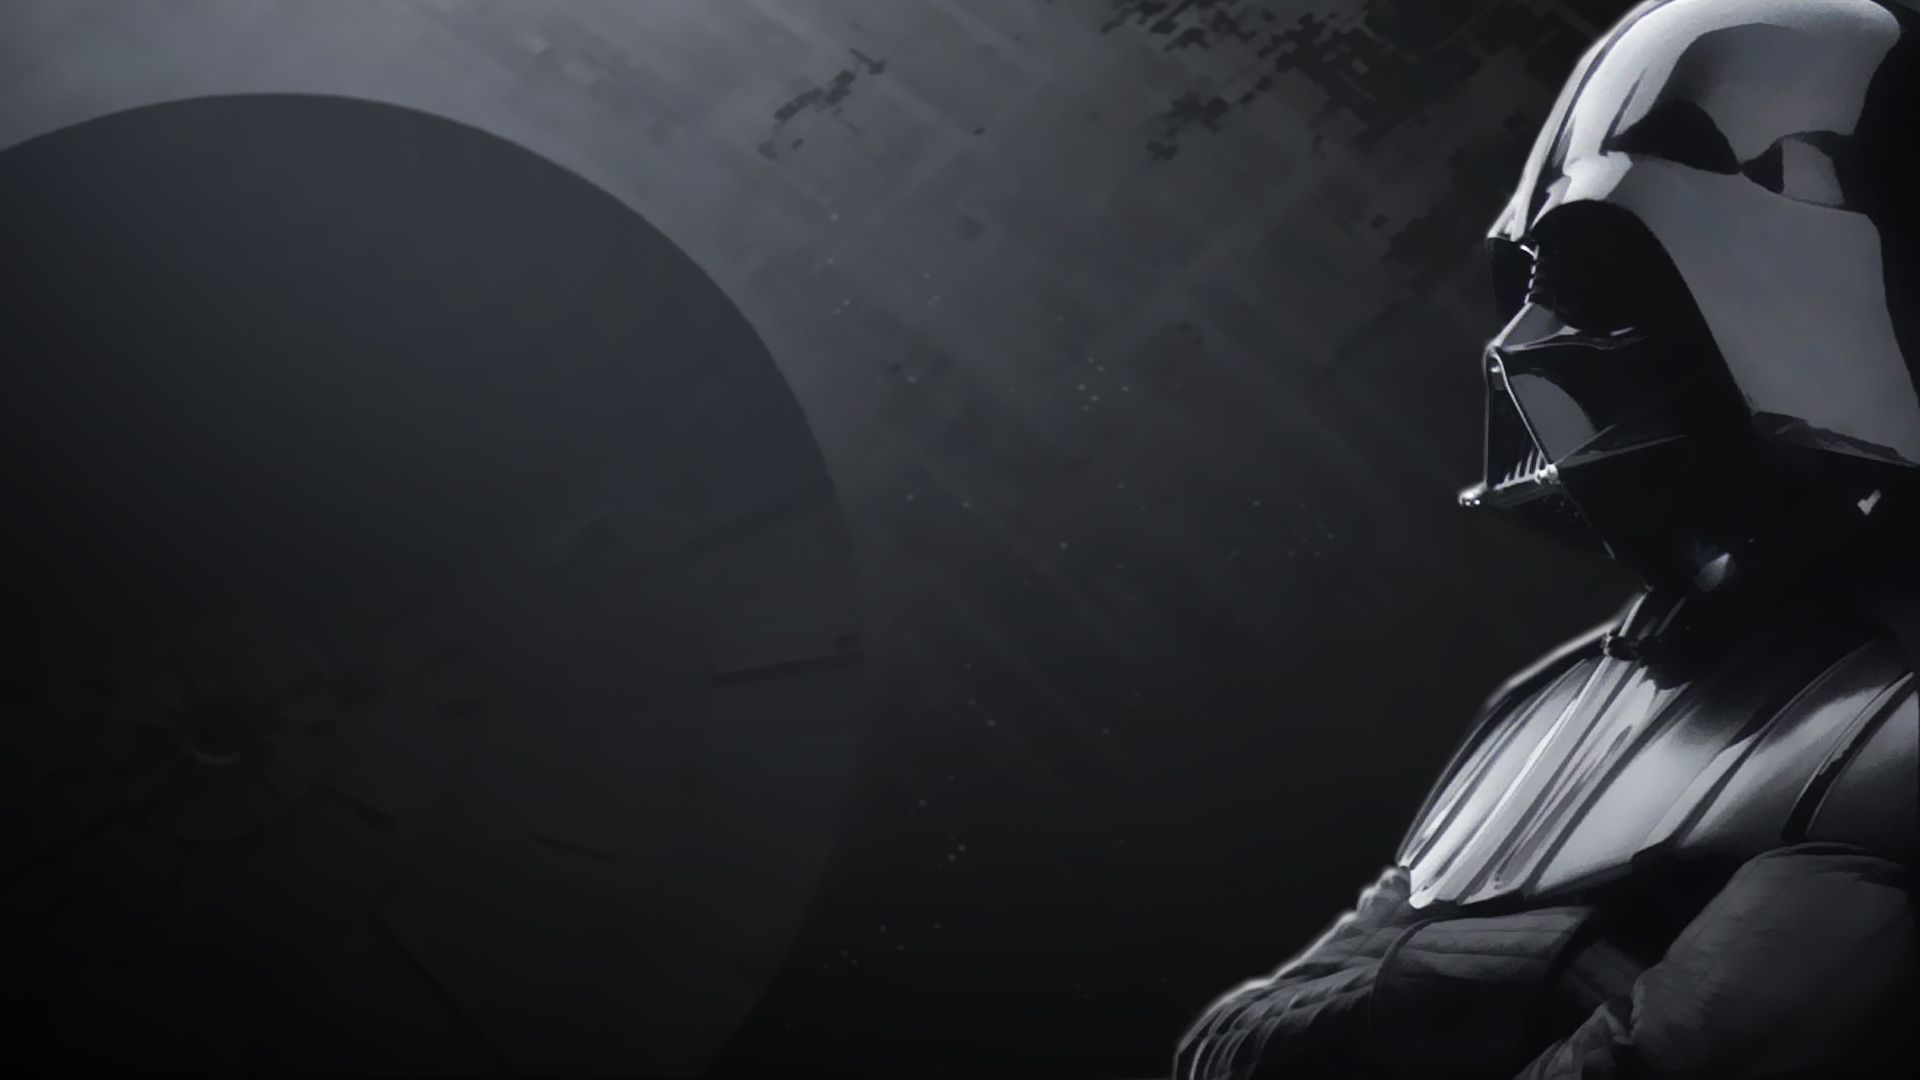 Full Hd P Darth Vader Wallpapers Hd Desktop Backgrounds